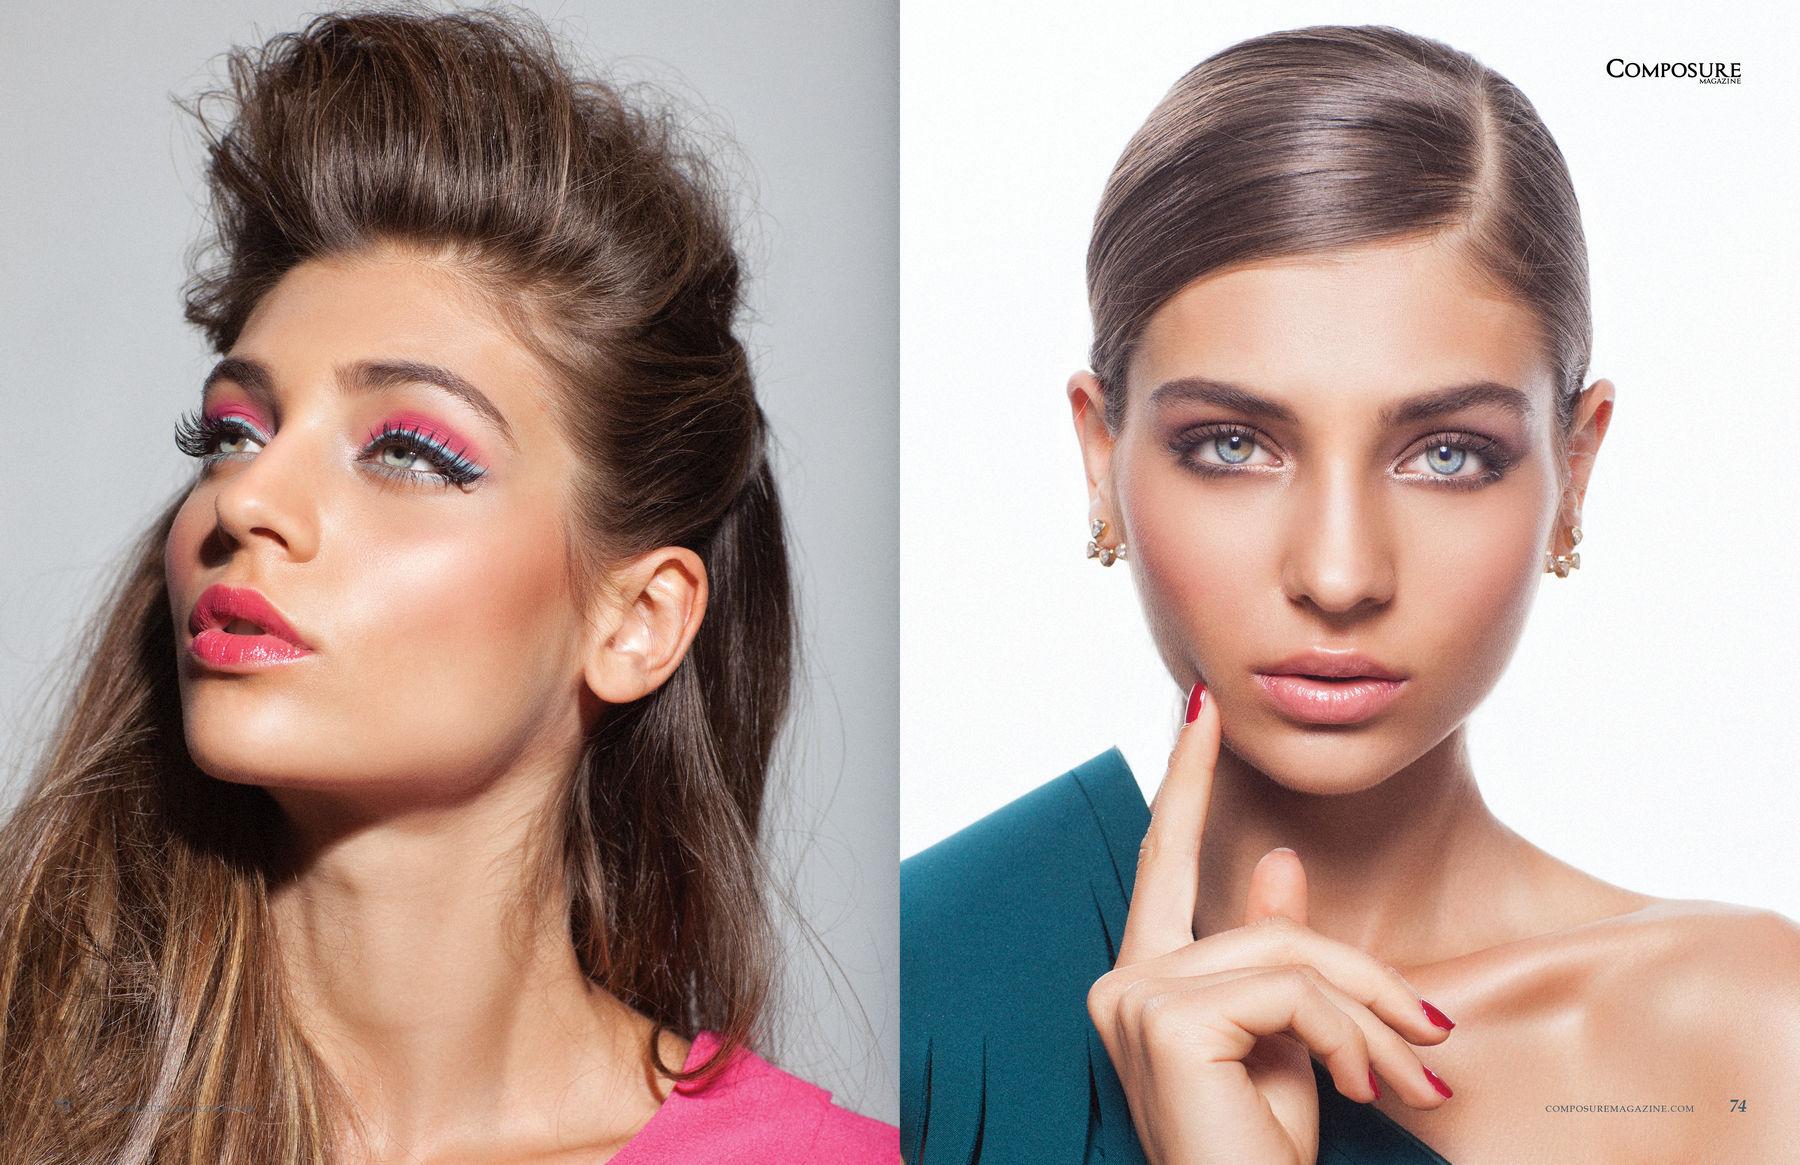 Decades of make up beauty editorial by John and Jane Hong